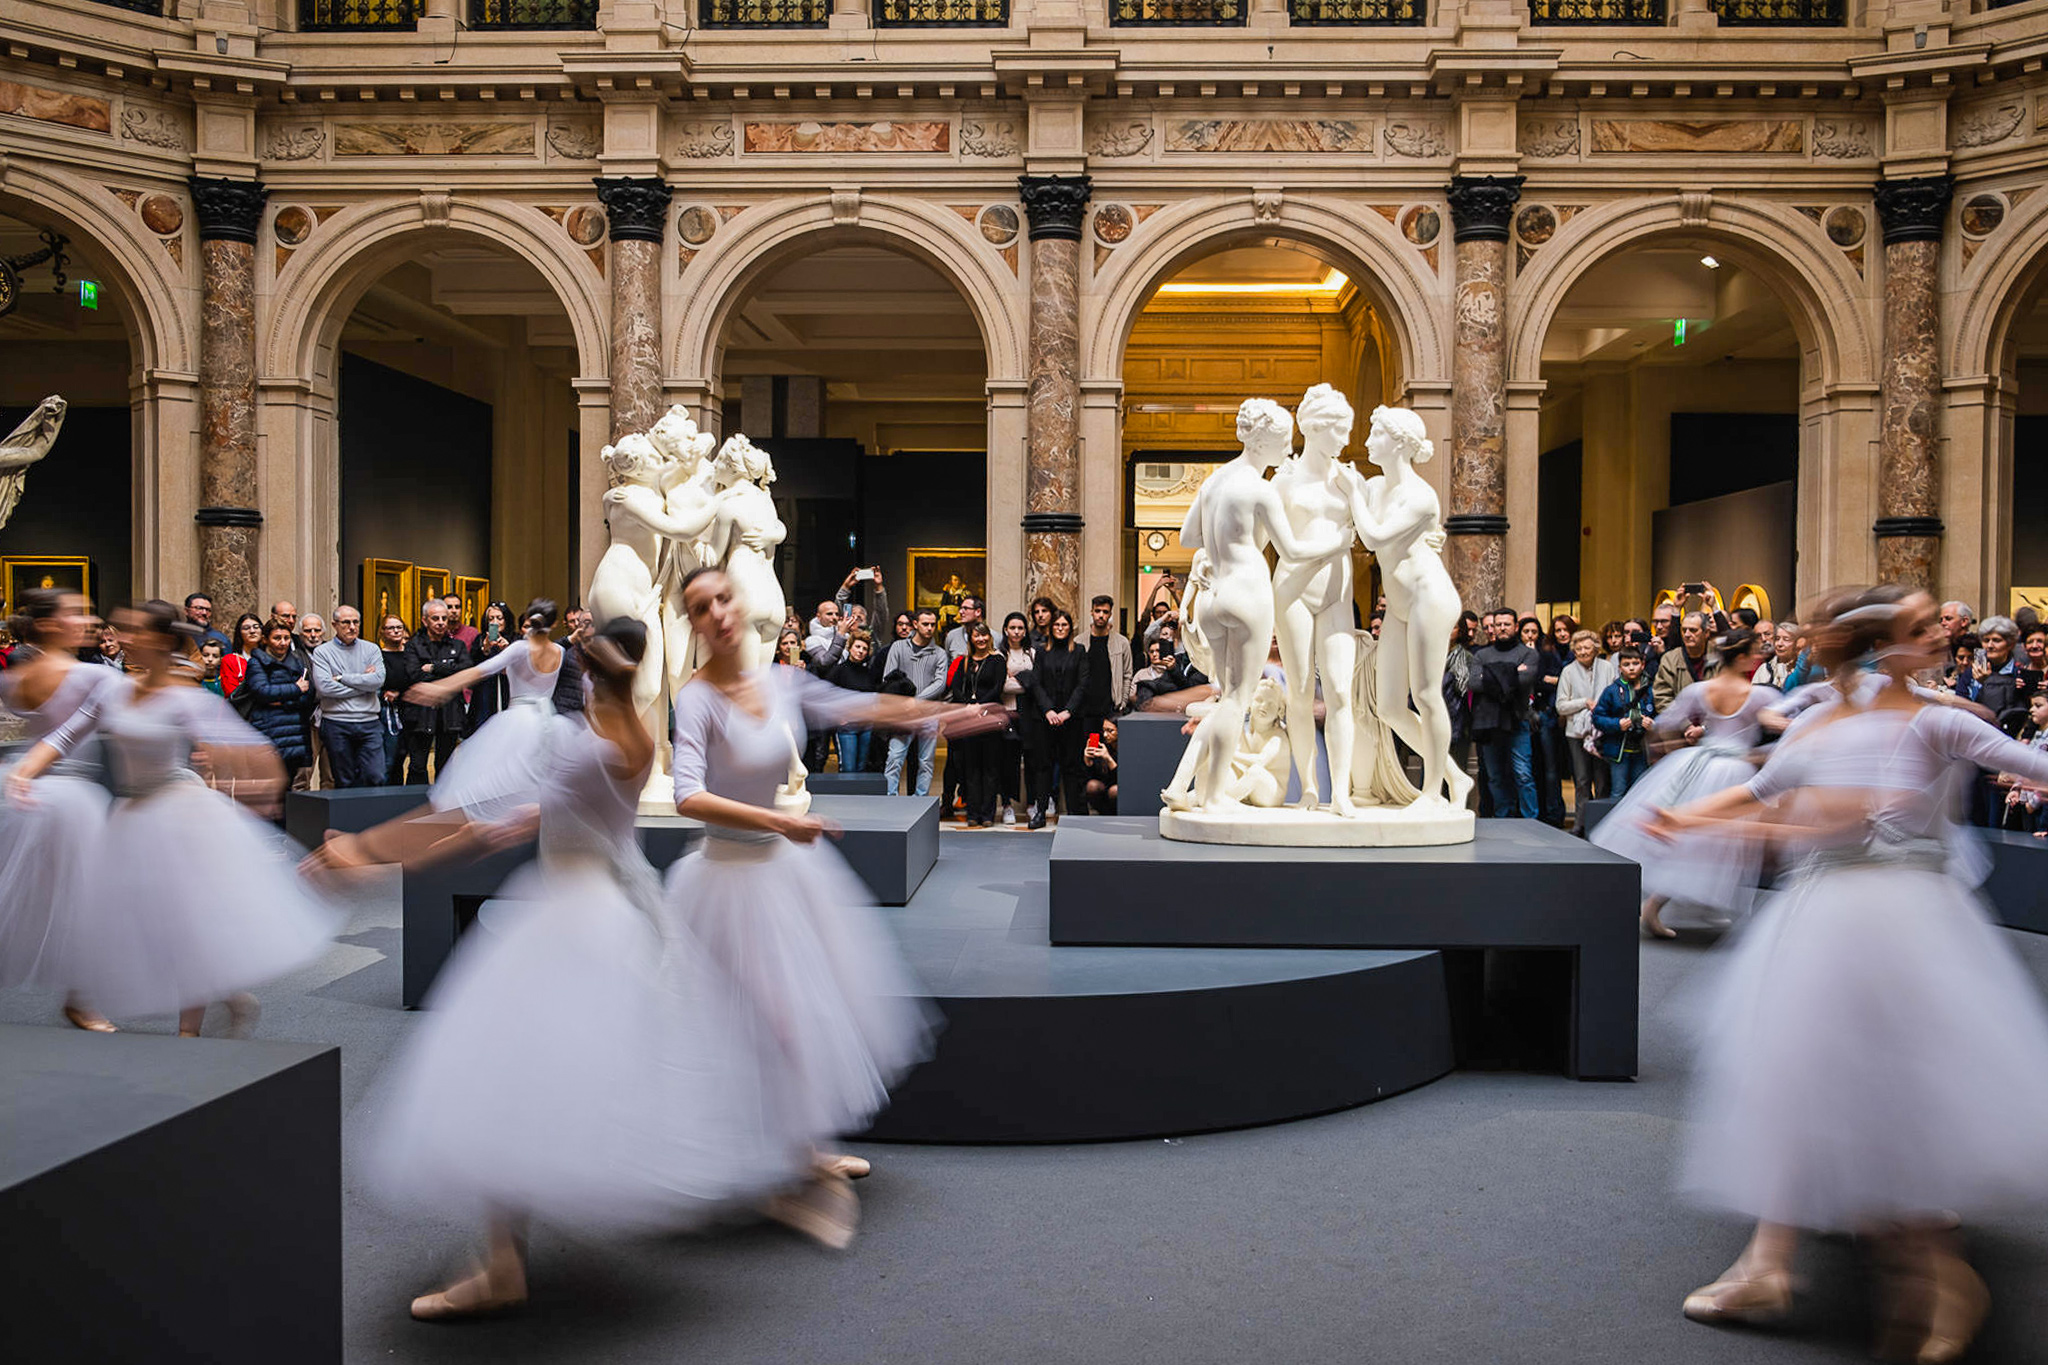 Flash mob per Canova e Thorvaldsen Gallerie d'Italia